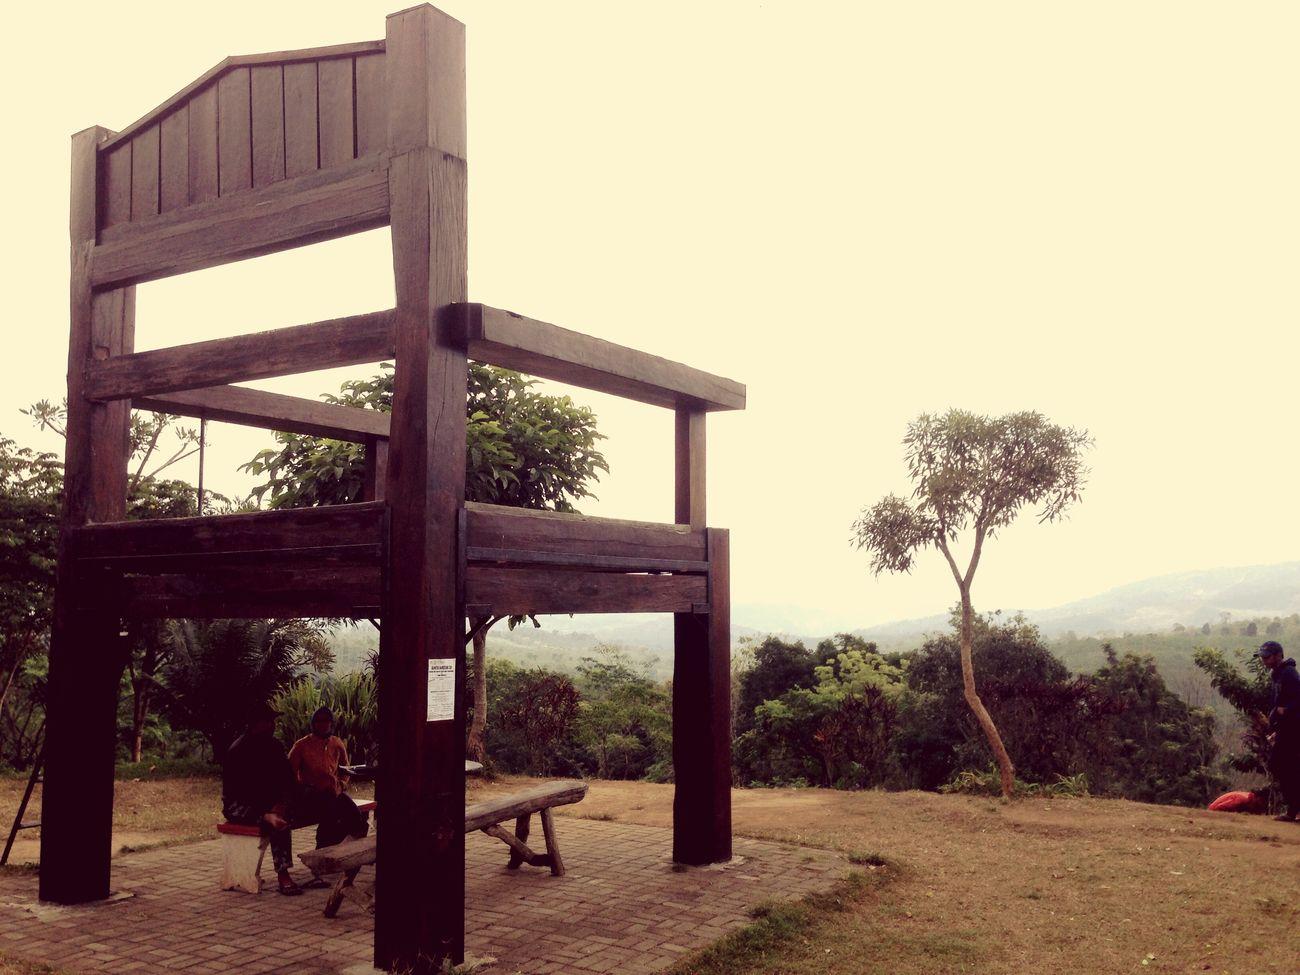 Giant Chair at Mountain Gumitir Mountains Traveling Gumitir Pesonajember Wonderful Indonesia INDONESIA Travel Travel Photography